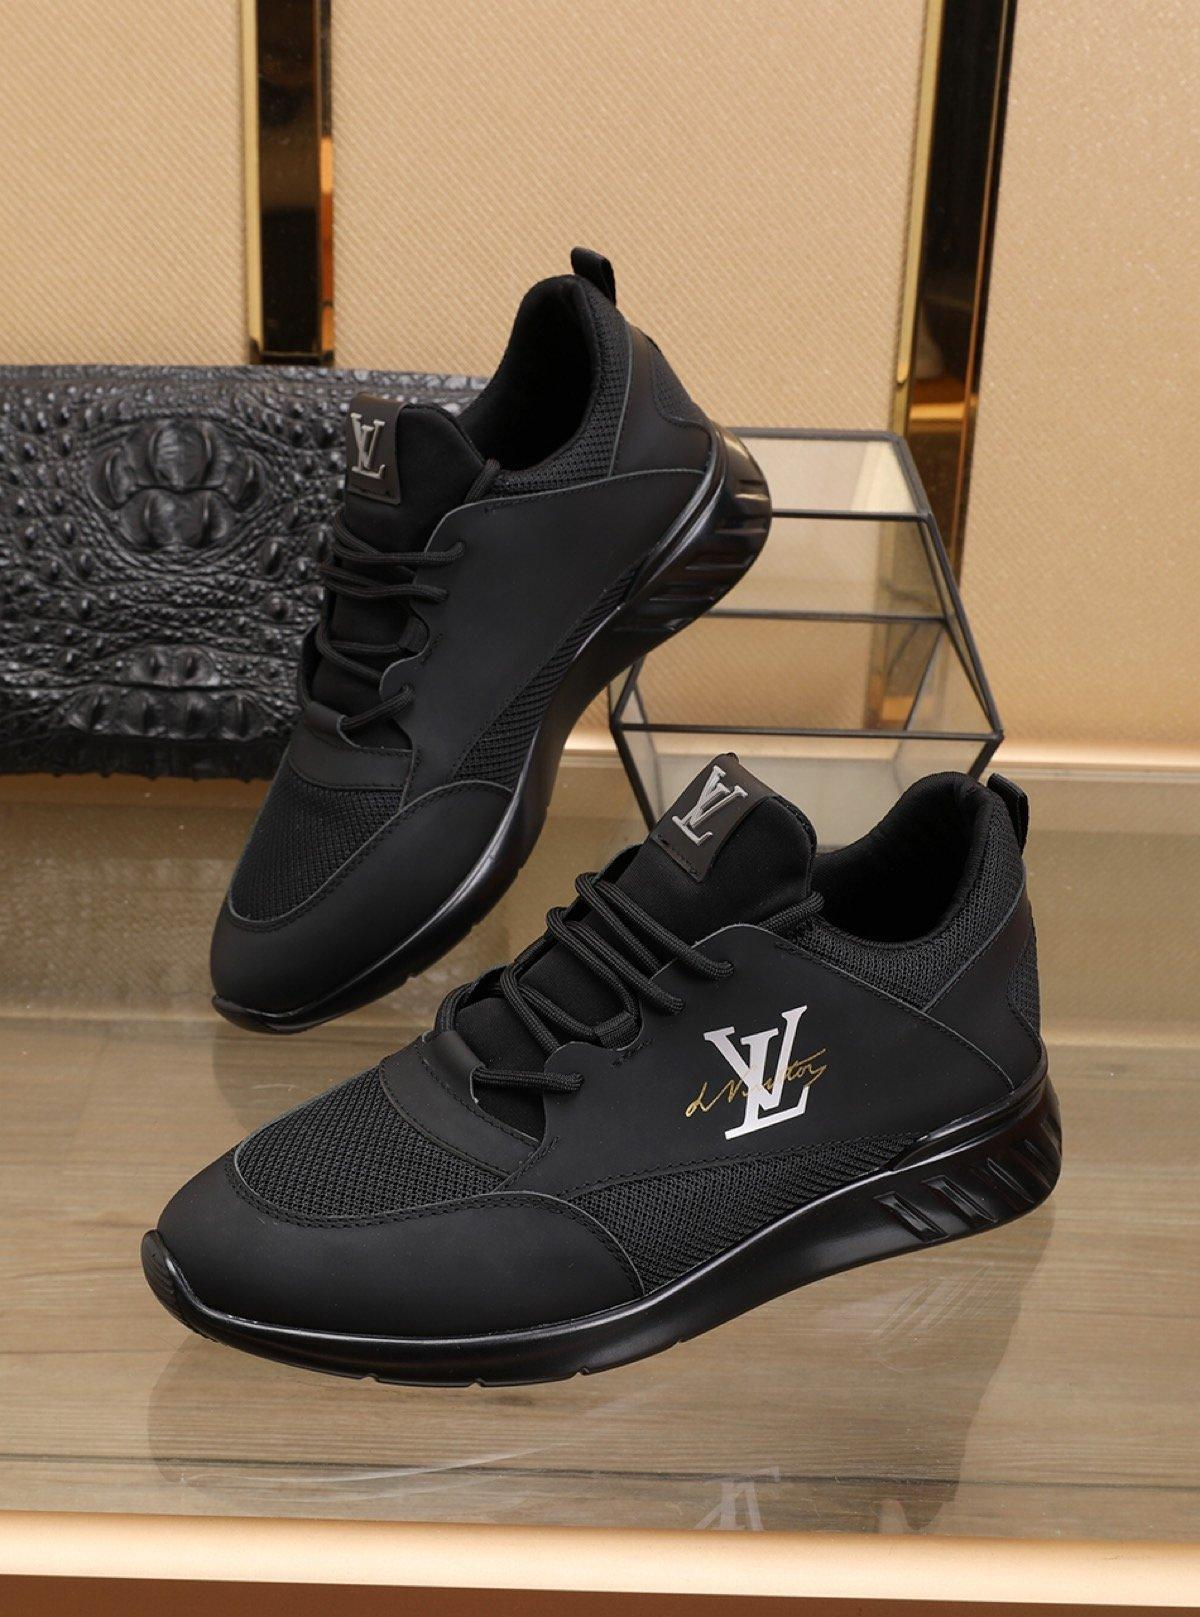 Mode Luxus Männer Freizeitschuhe Leder kundenspezifischen Männer Schnür-Turnschuhe atmungsaktive Schuhe der Qualitätsmänner Trainer Schuhe RUN AWAY SNEAKER 06